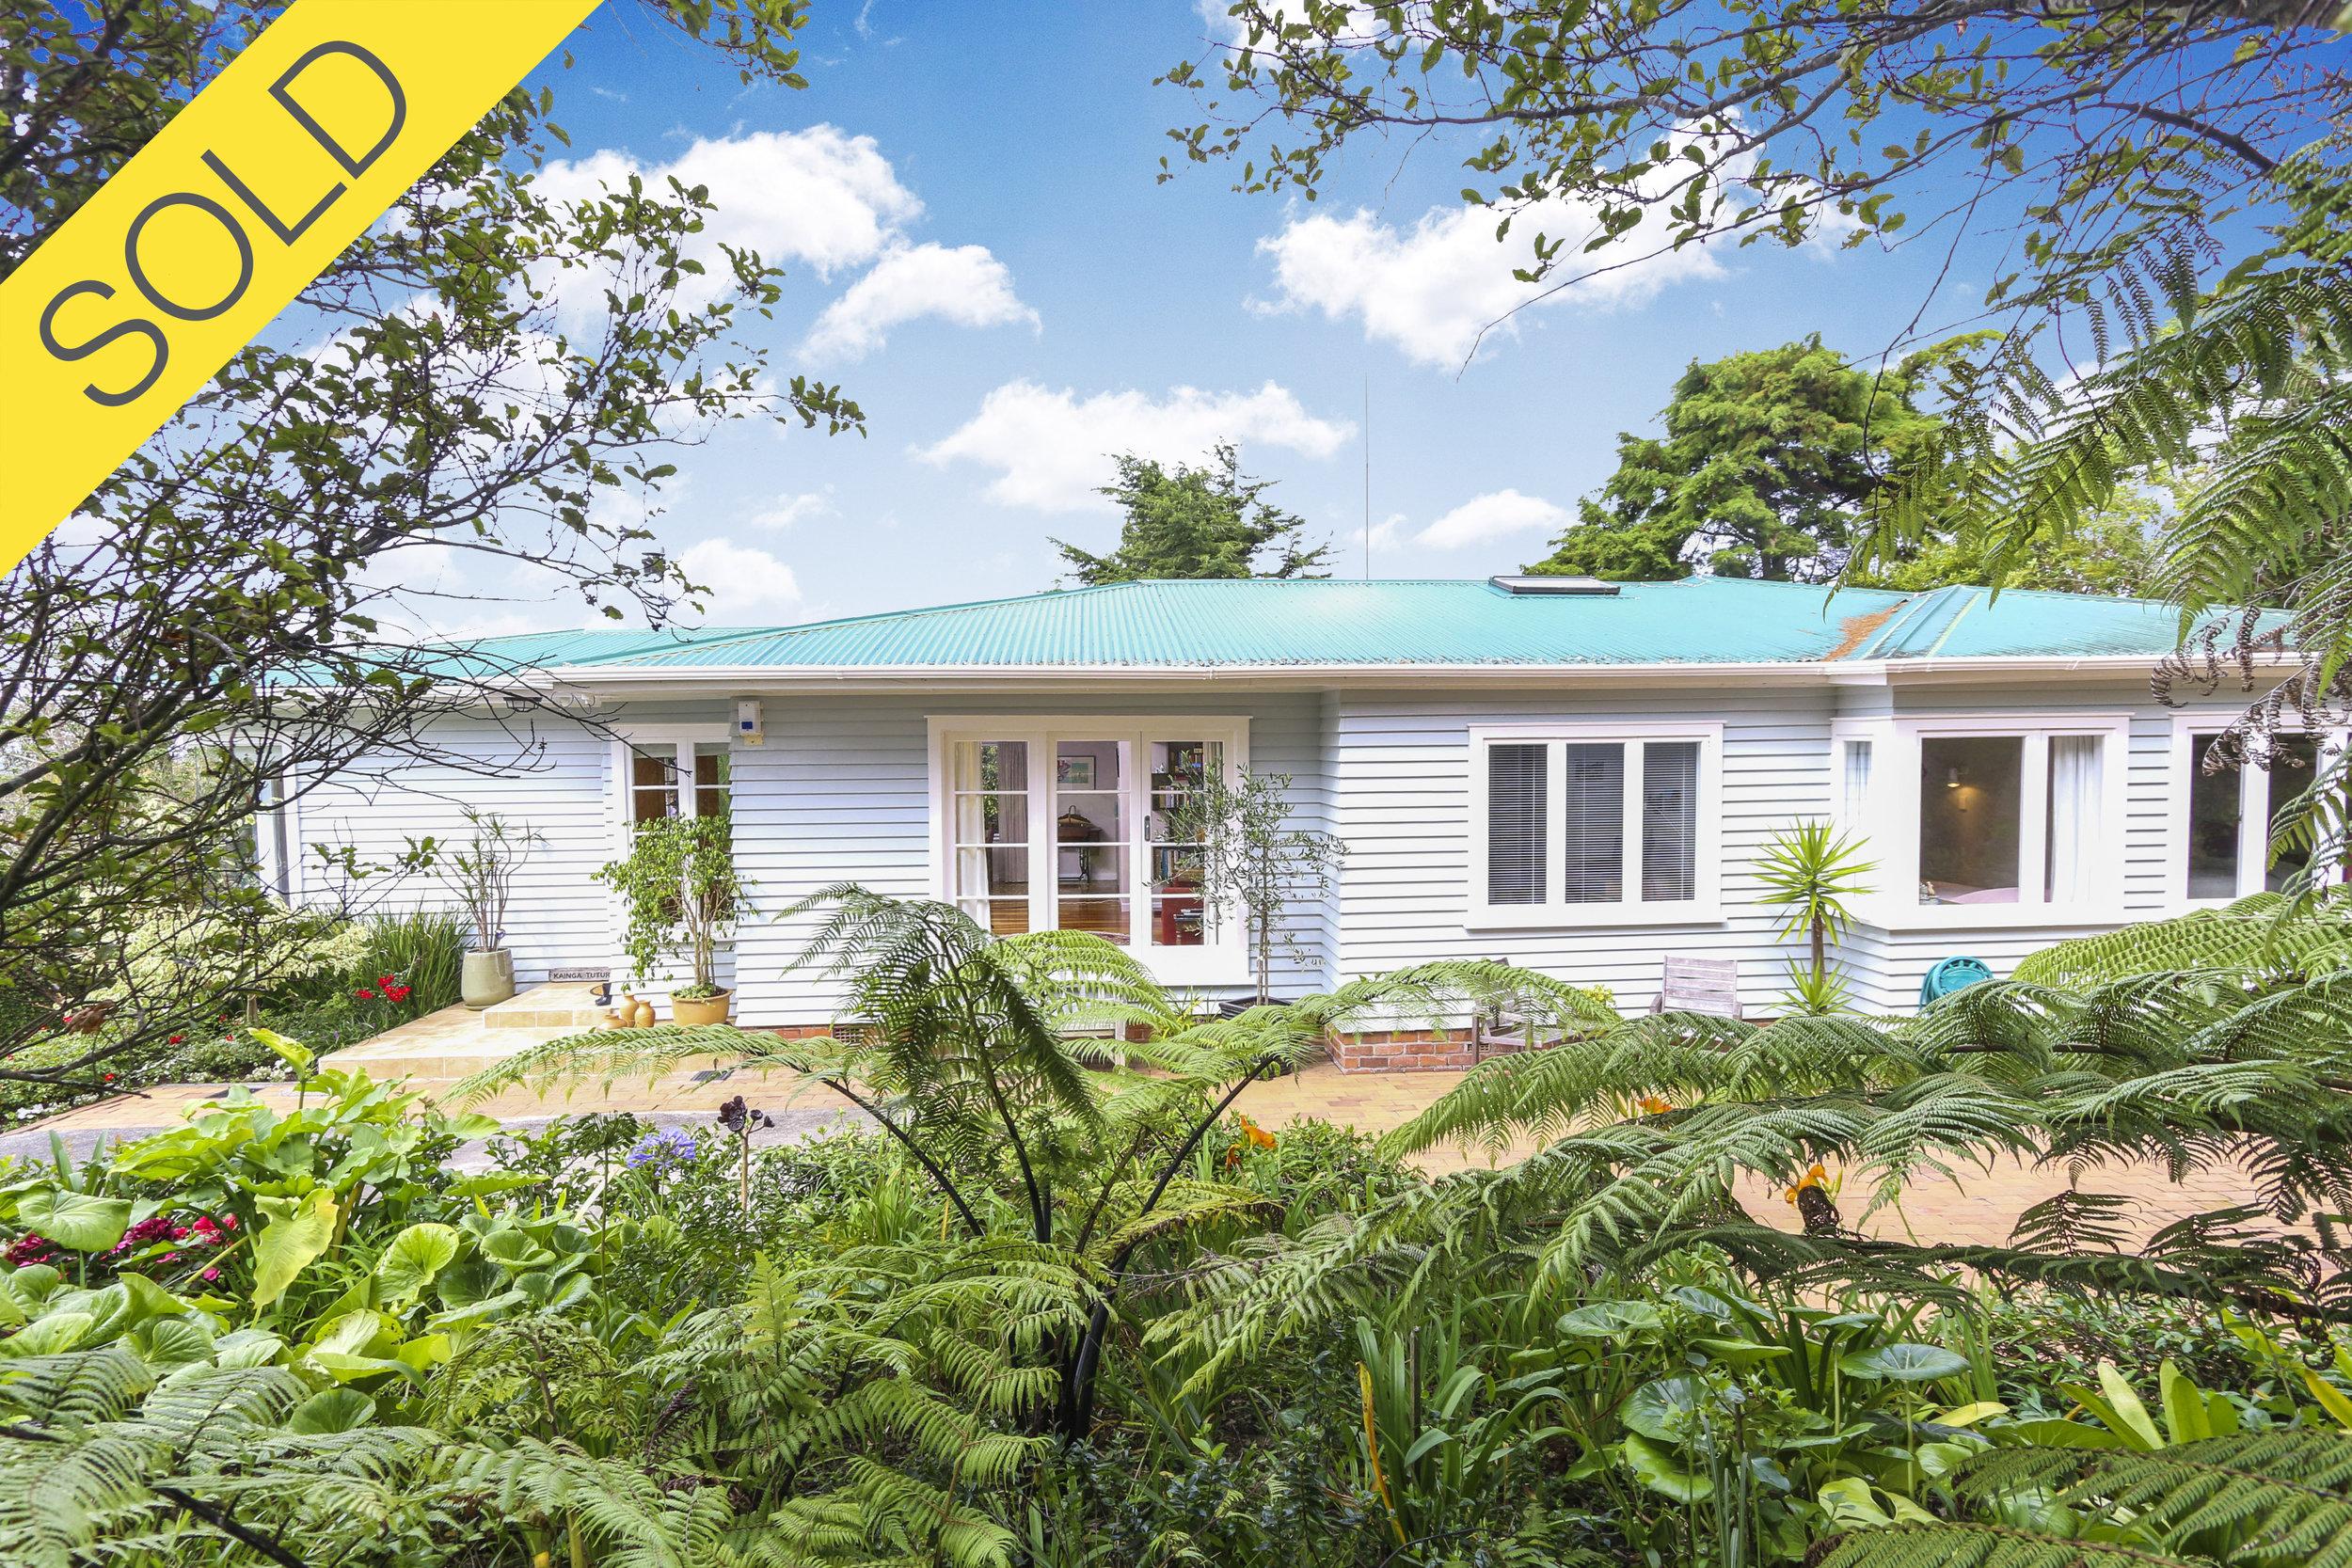 55 Goodall Street, Hillsborough, Auckland - SOLD MARCH 20174 Beds I 2 Baths I 2 Parking